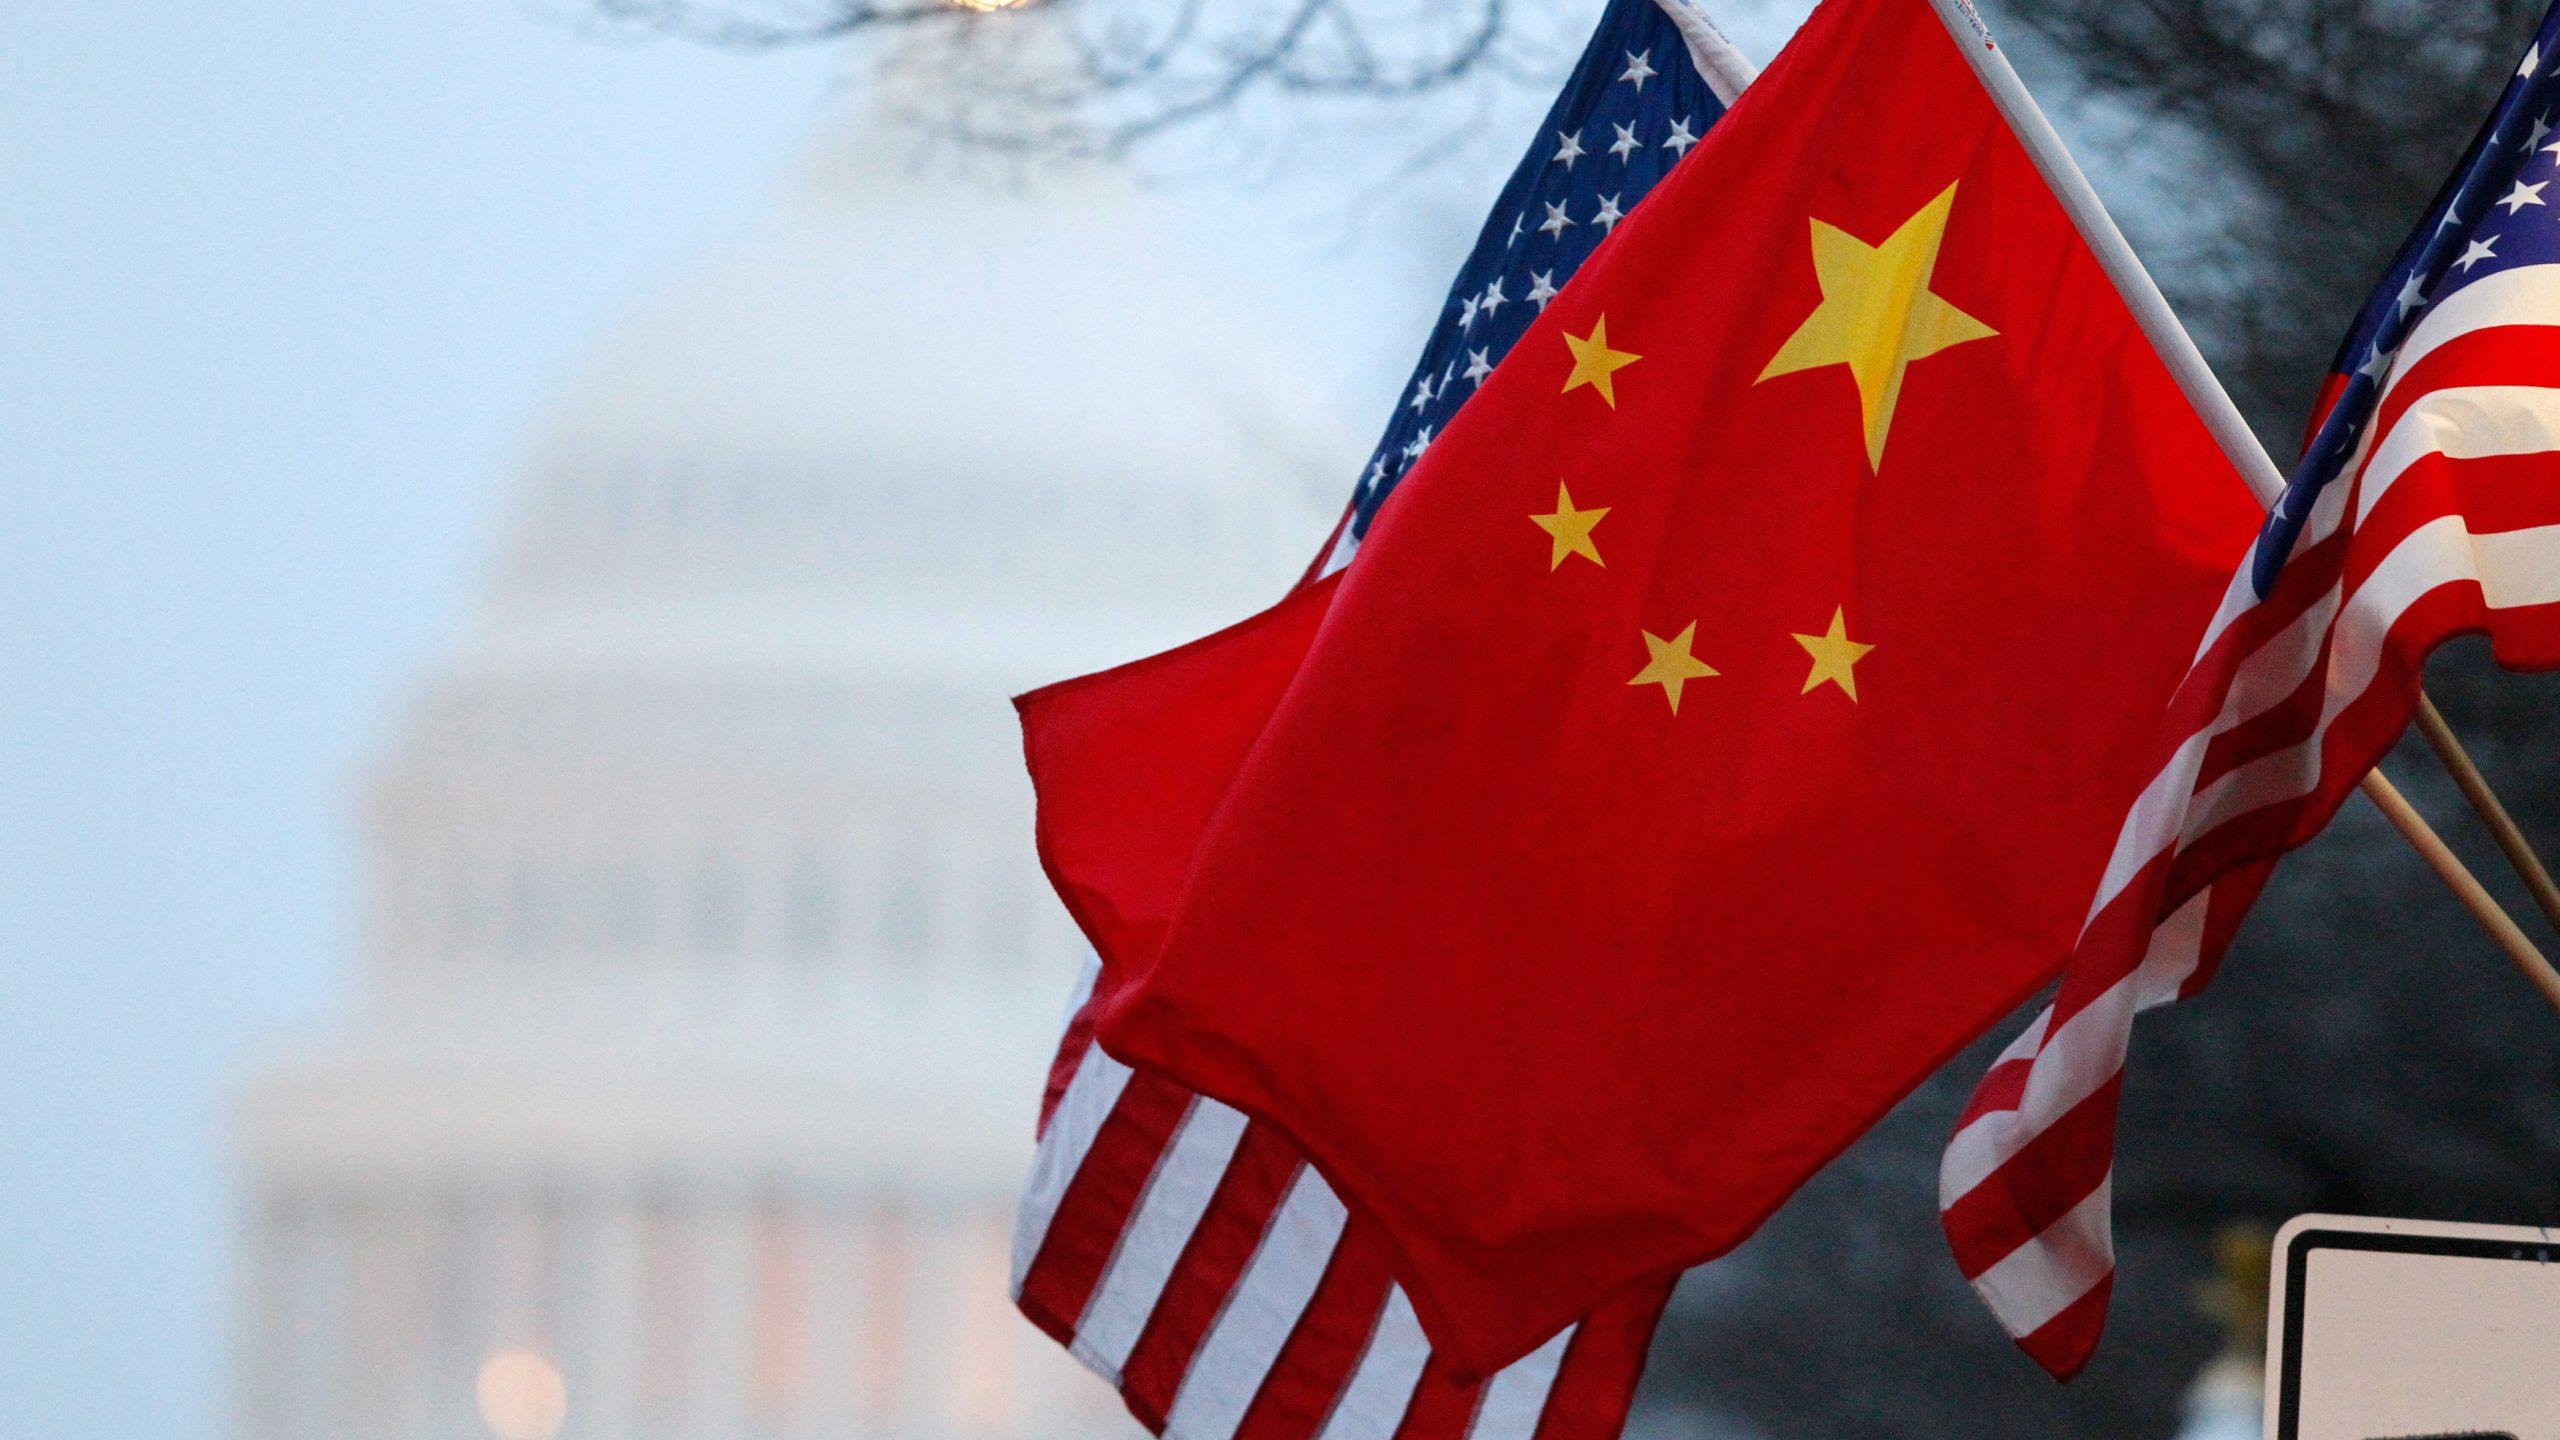 Beijing Asks Washington To Resume Dialogue With The Taliban